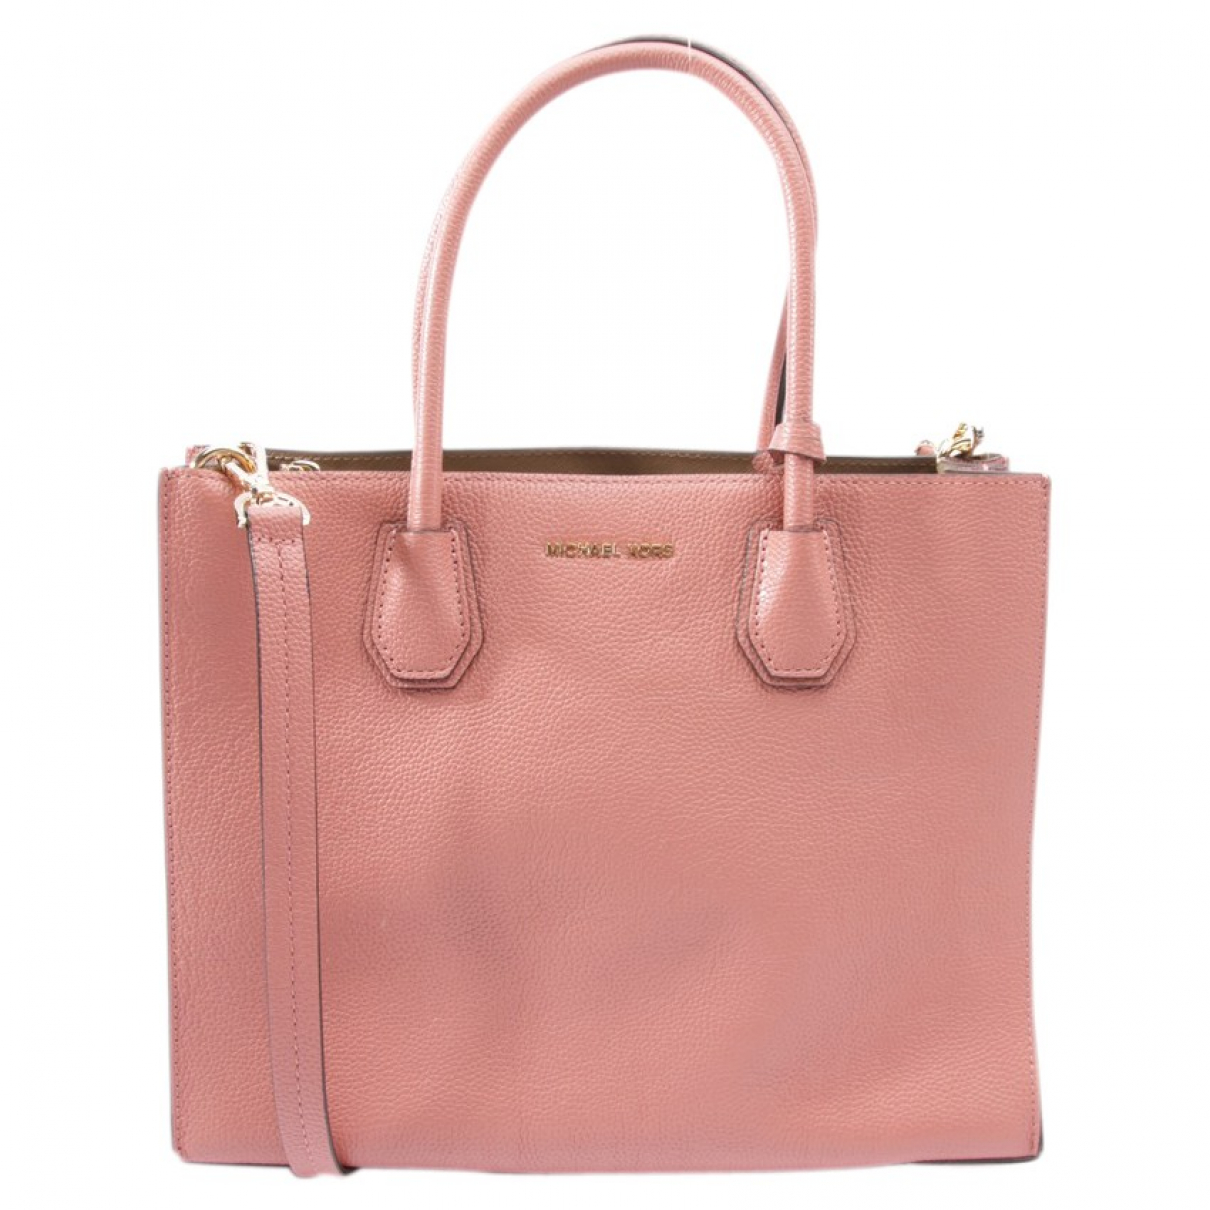 Michael Kors \N Pink Leather handbag for Women \N